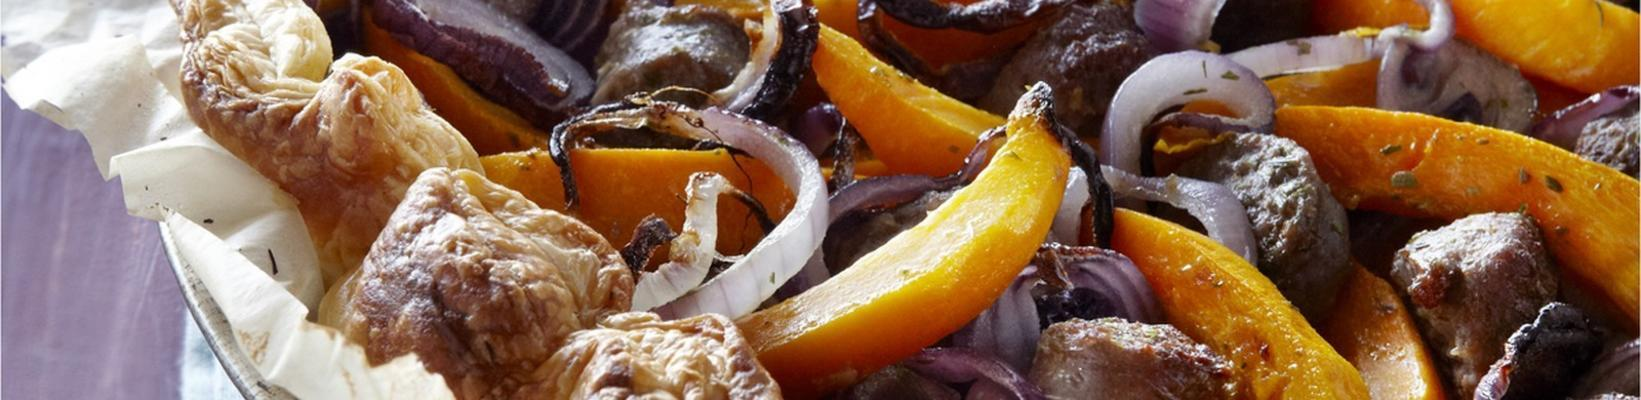 savory pie with sausage, onion and pumpkin